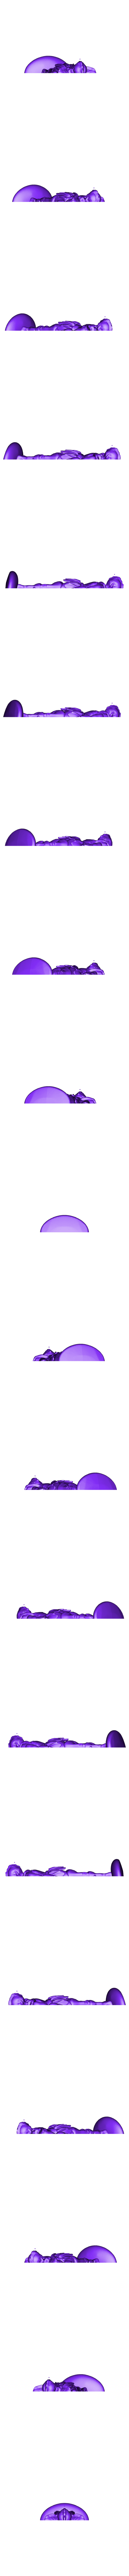 poisson 2.stl Download OBJ file 10 Intergalactic Humanoids • 3D print object, Majin59